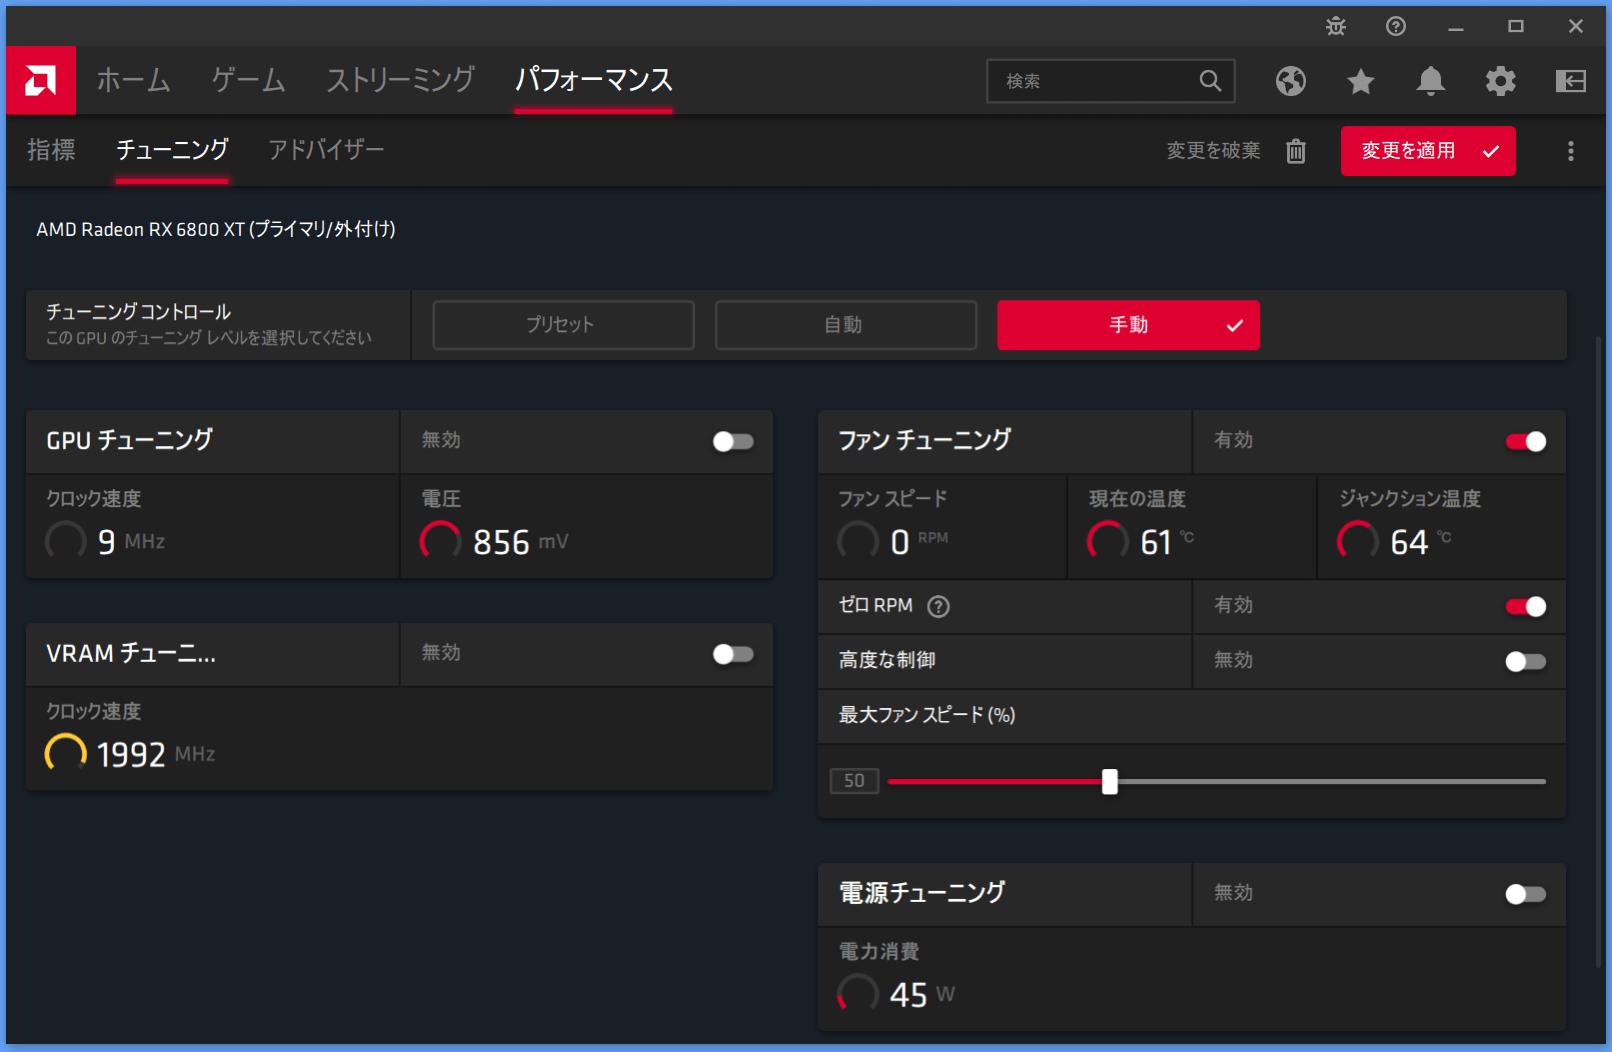 Radeon RX 6800 XT_Radeon-Setting_7-1_Fan